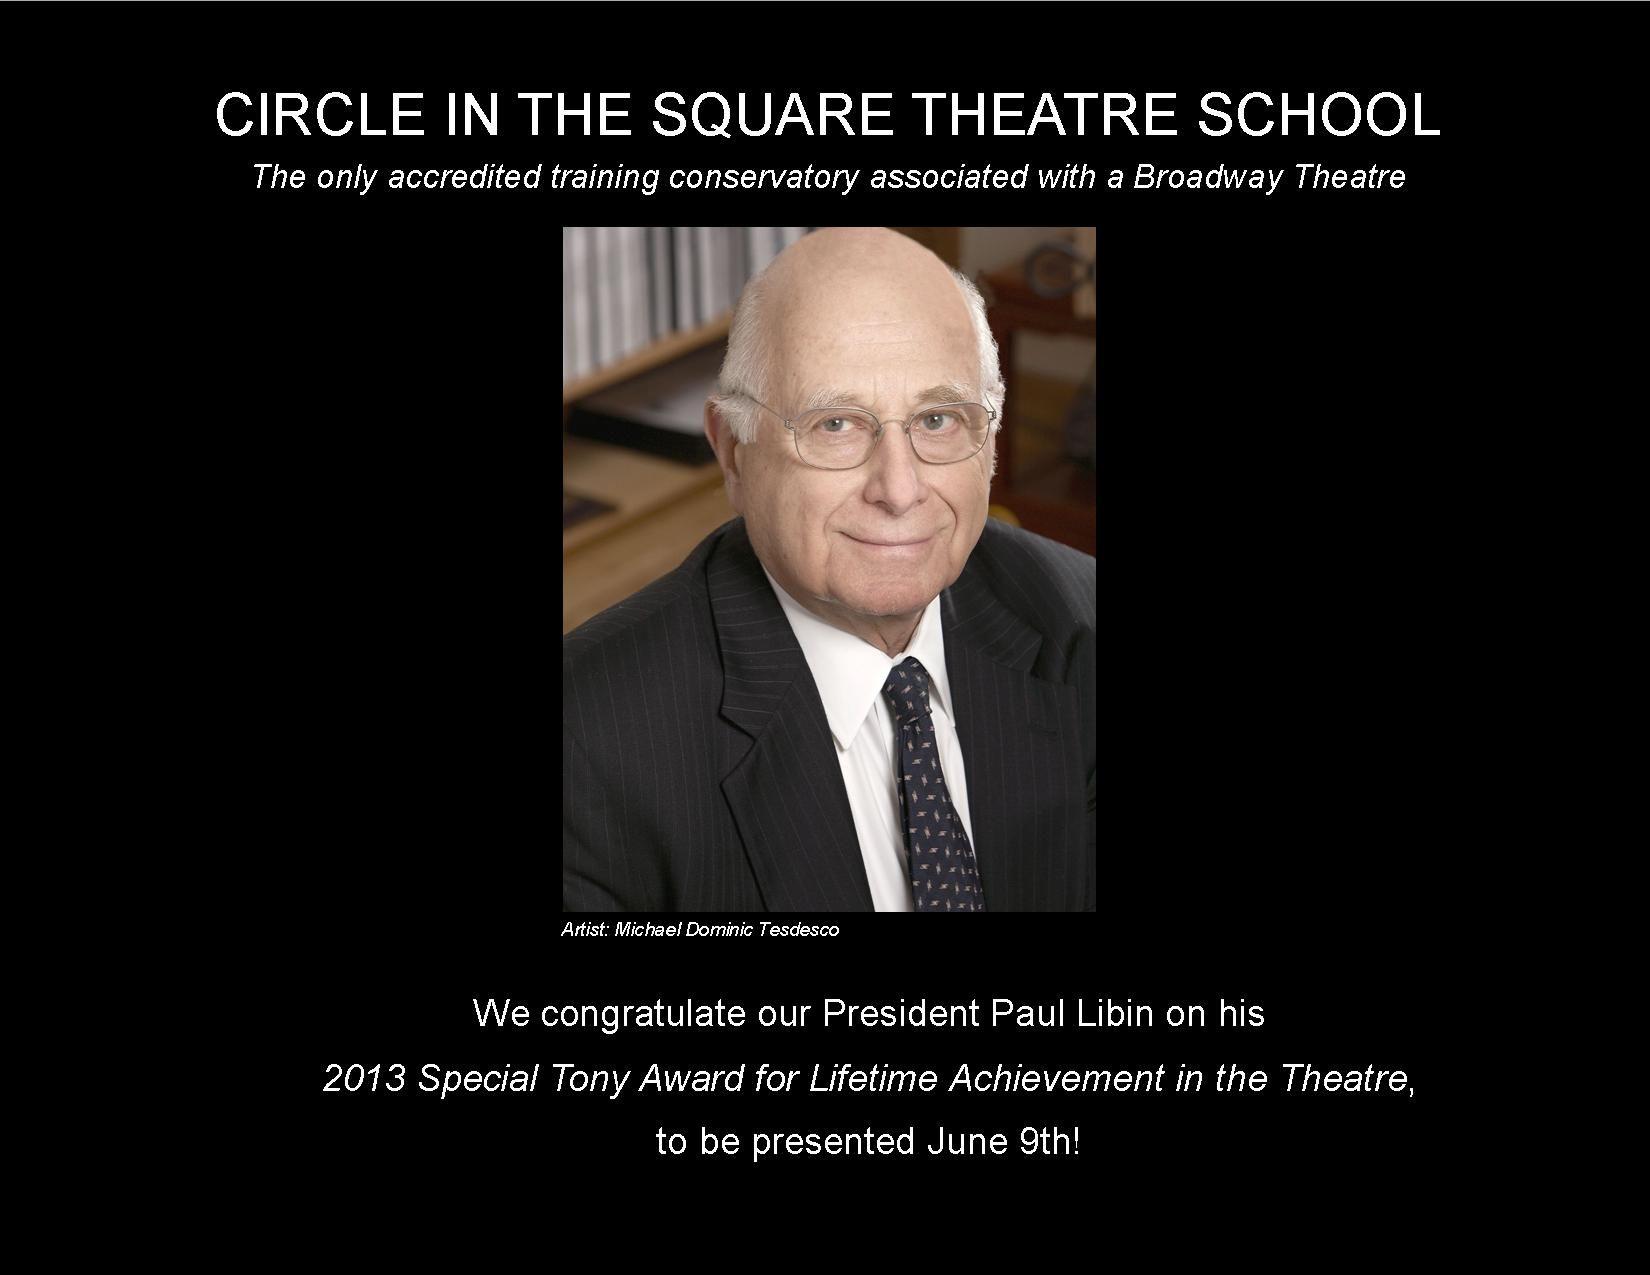 Pin by Pamela England on Theatre Internships